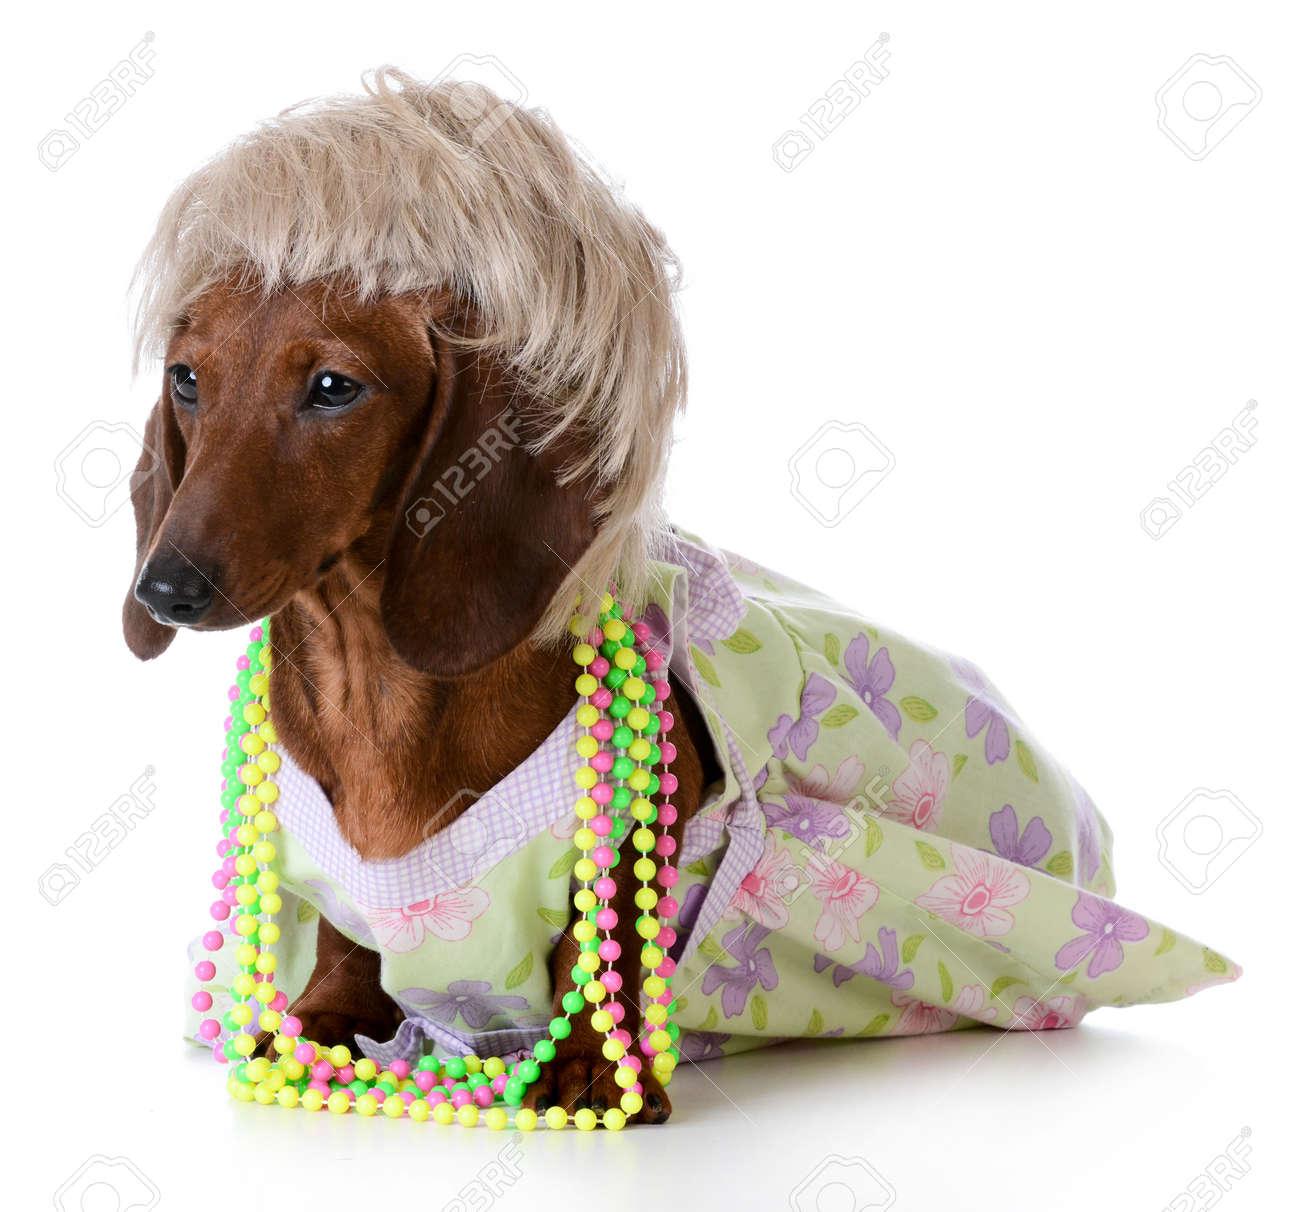 Female Dog Miniature Dachshund Wearing Wig And Clothing On Stock